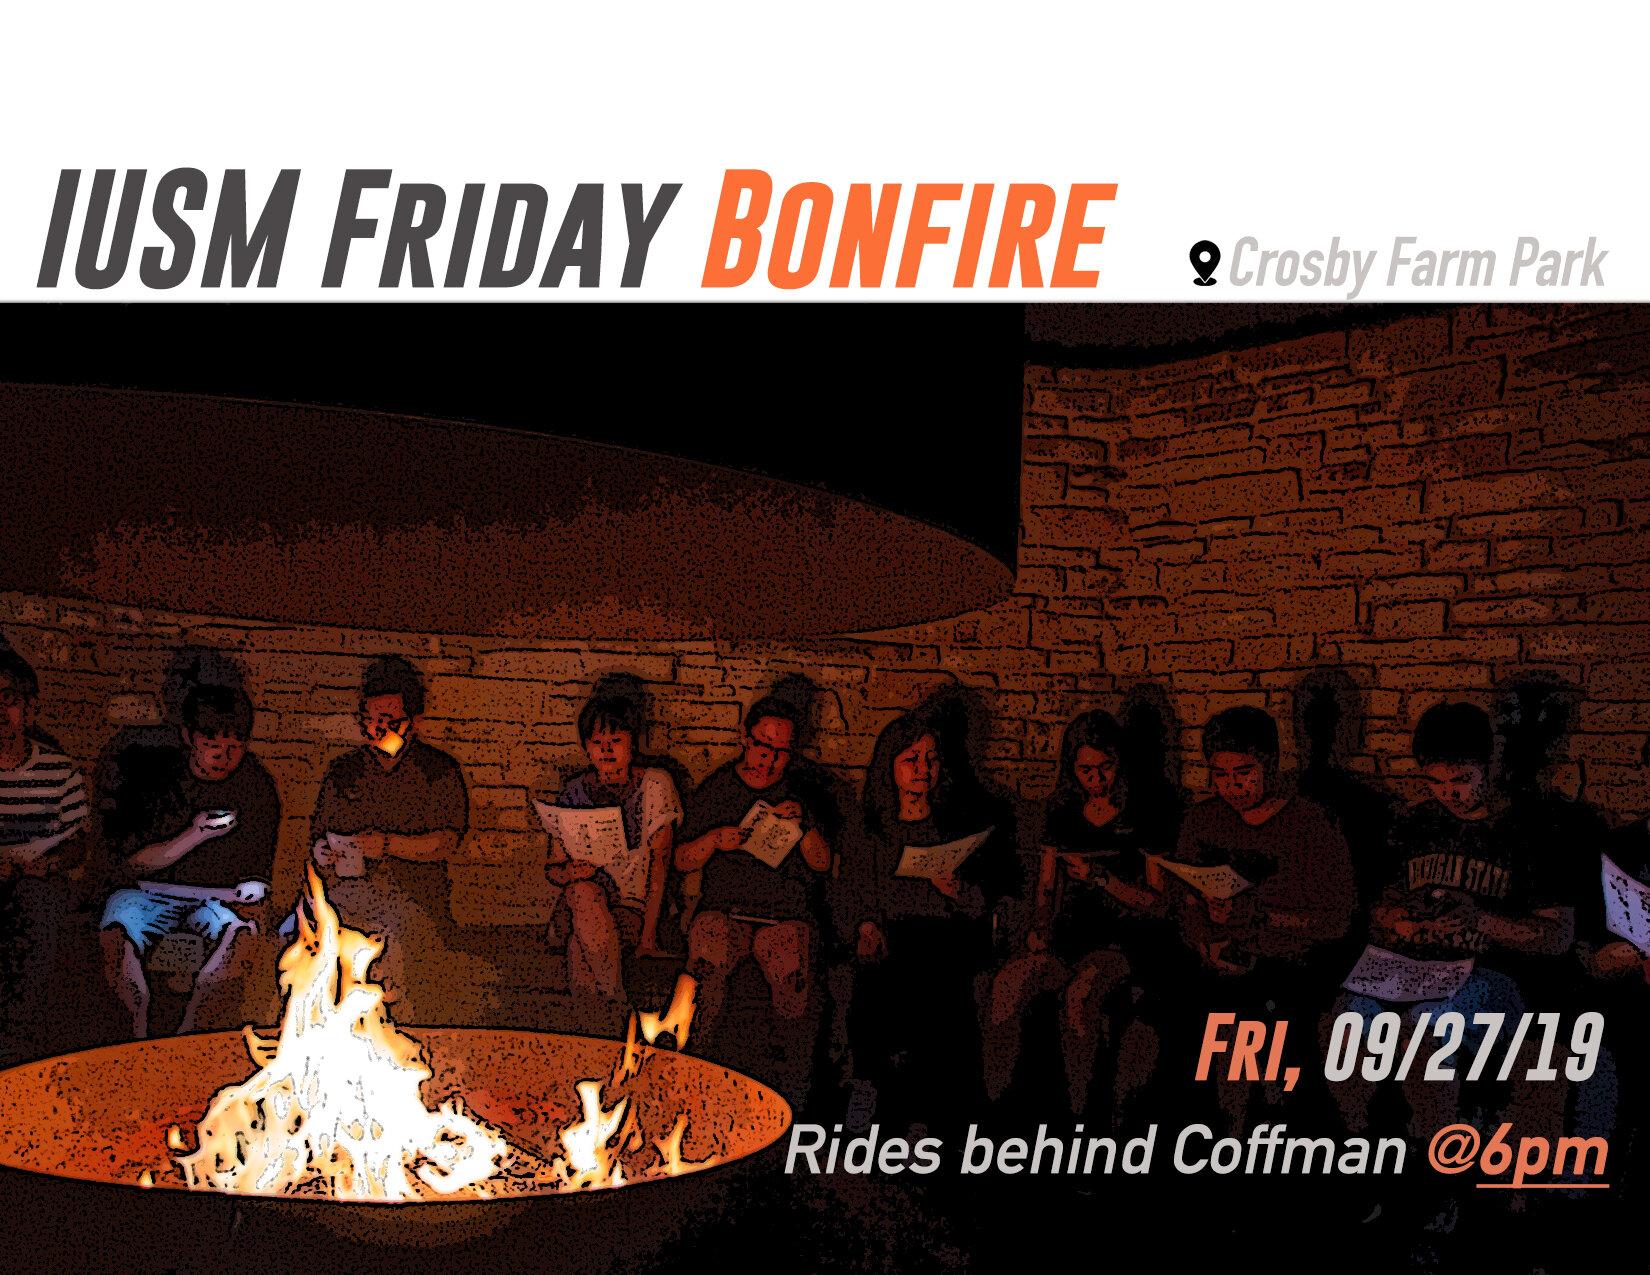 IUSM_Friday_crosby_bonfire_7.jpg